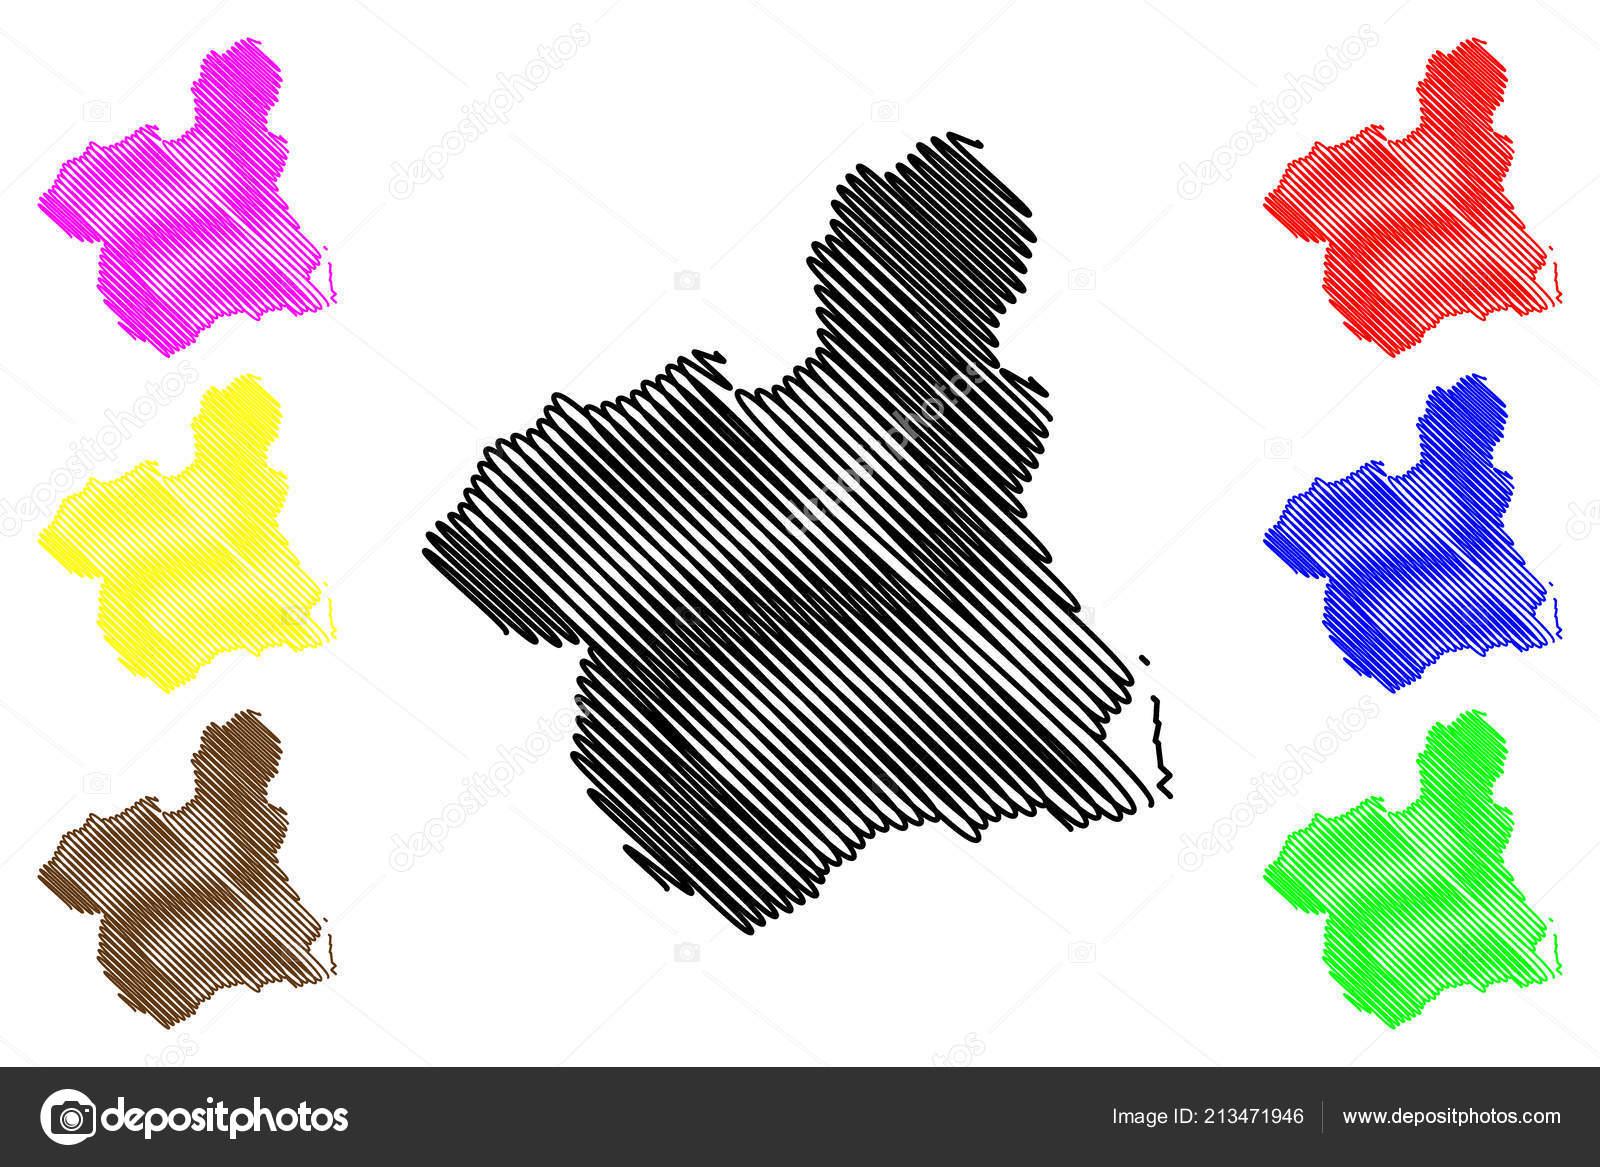 Autonome Regionen Spanien Karte.Murcia Konigreich Von Spanien Autonome Region Karte Vektor